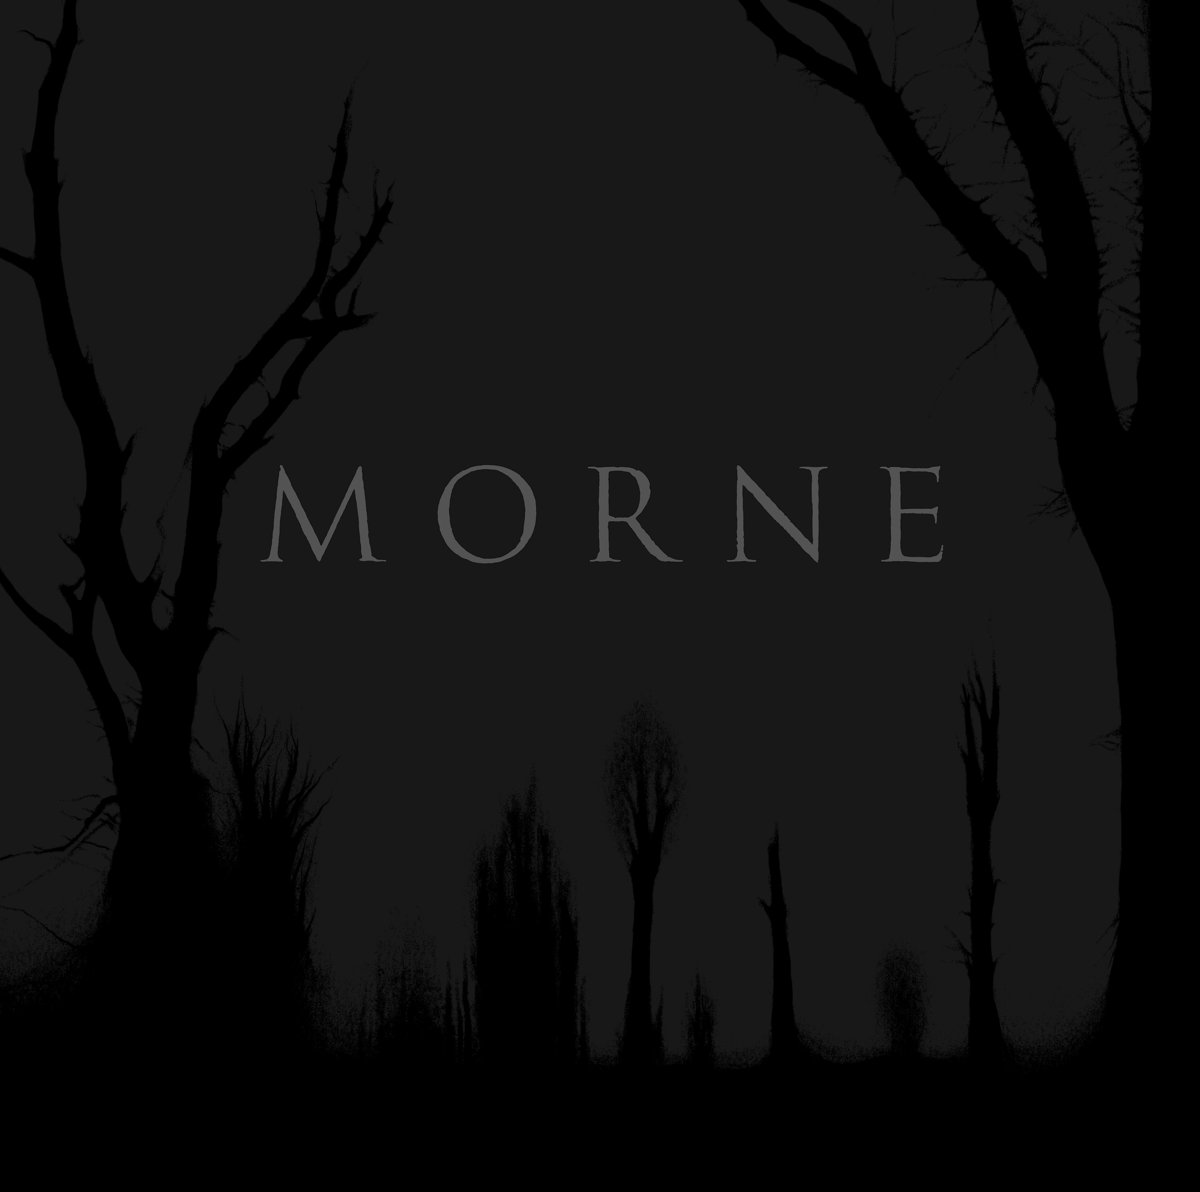 MORNE - Rust cover